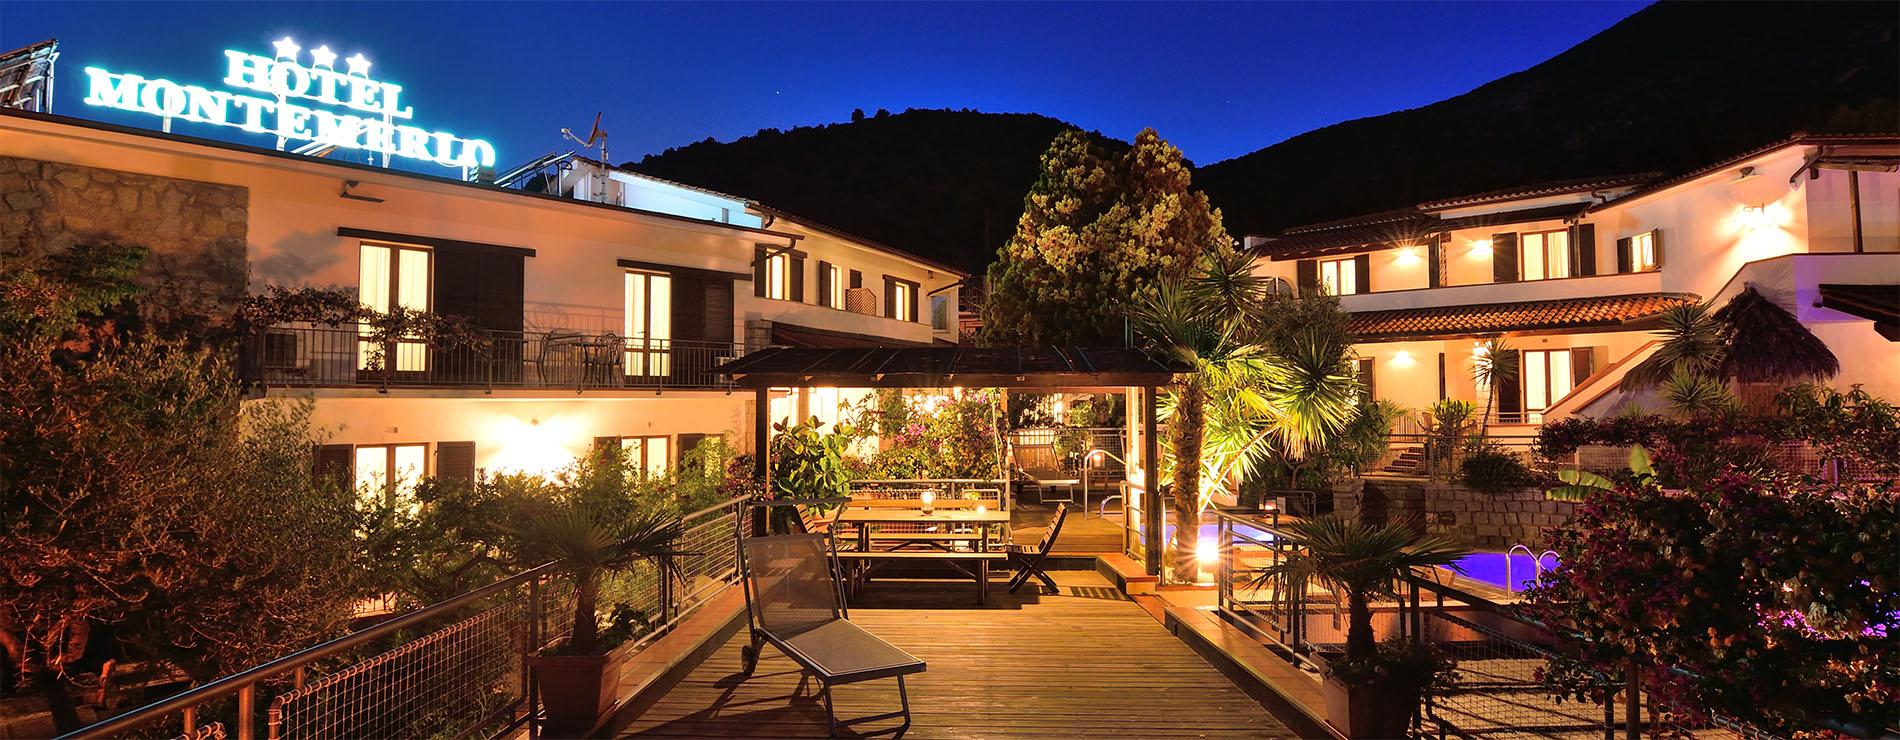 Hotel Montemerlo Fetovaia